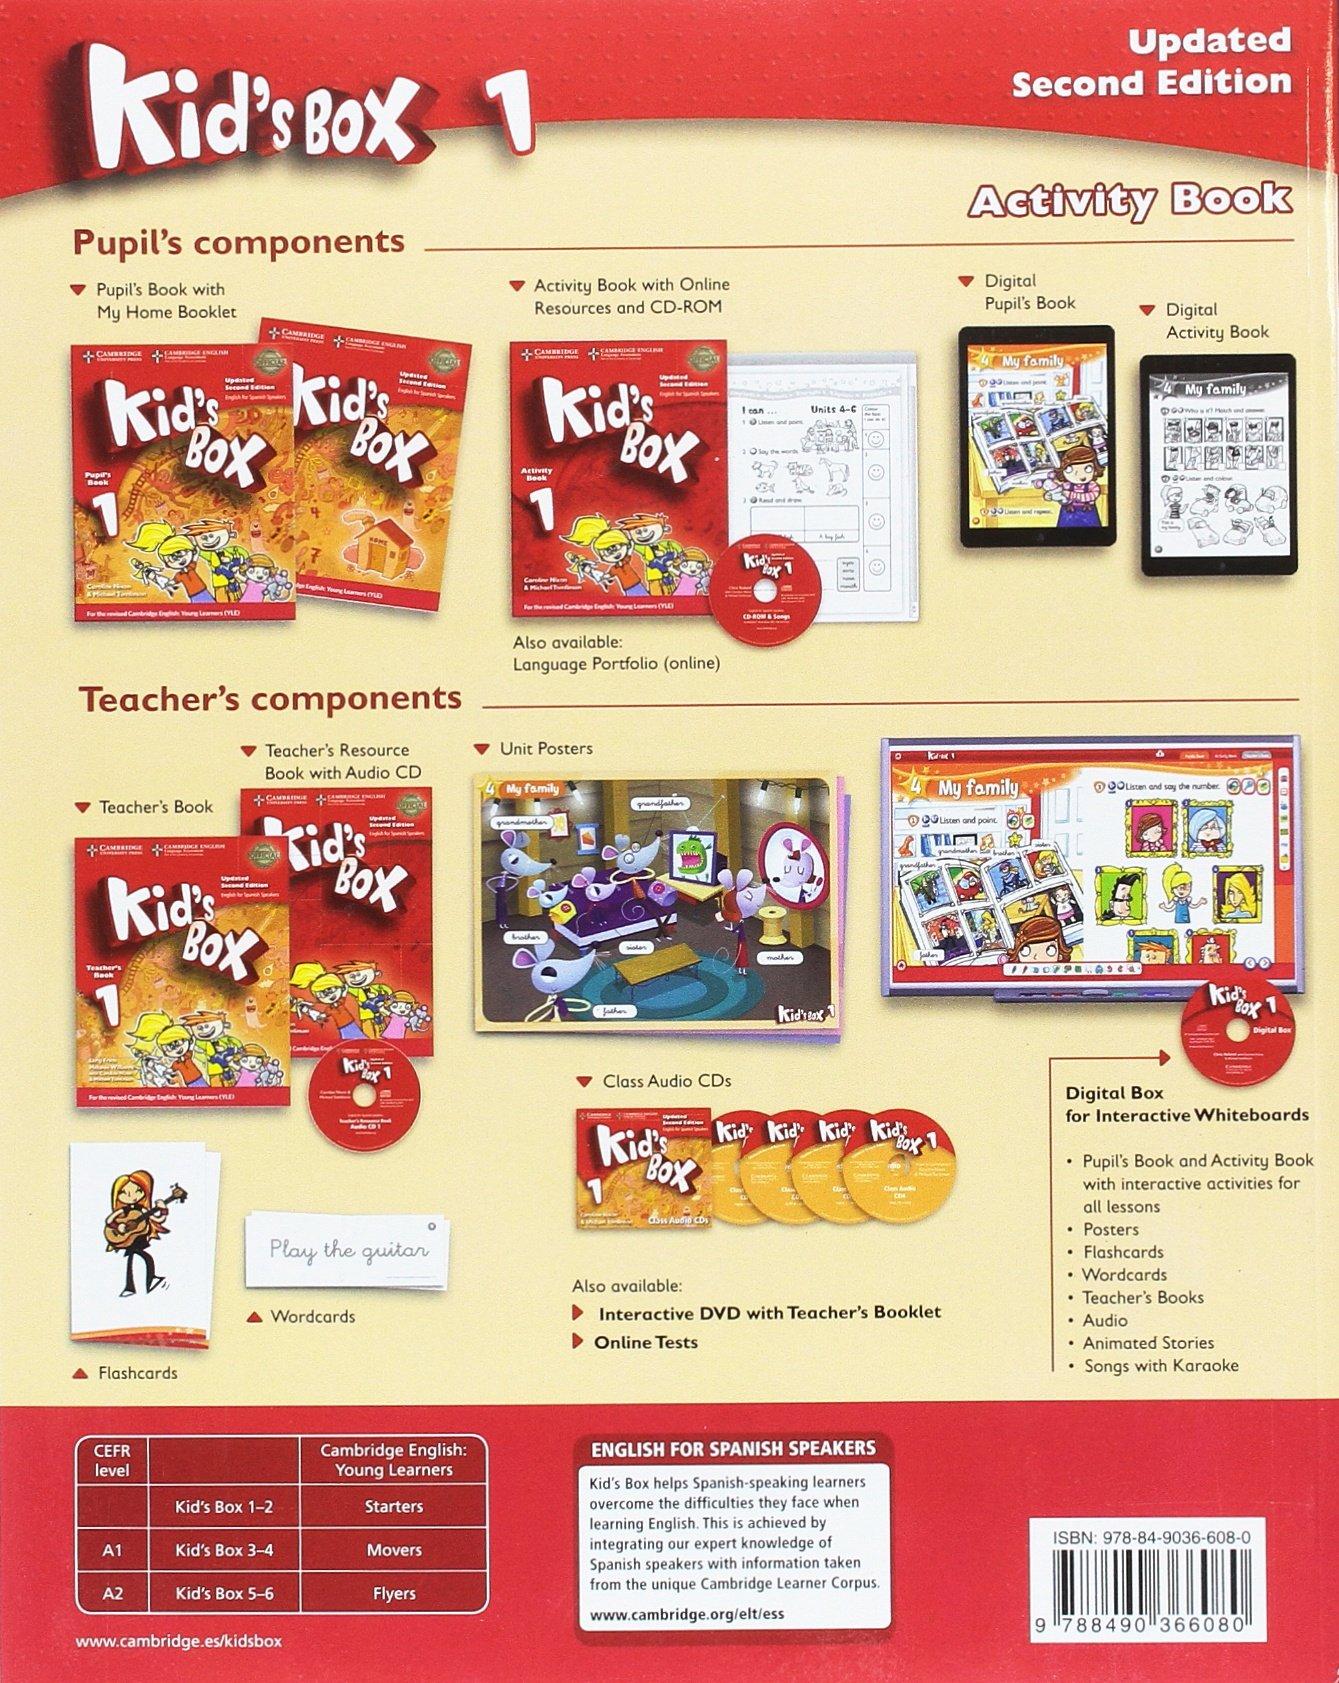 Kid's Box Level 1 Activity Book with CD-ROM Updated English for Spanish  Speakers: Amazon.co.uk: Caroline Nixon, Michael Tomlinson: 9788490366080:  Books